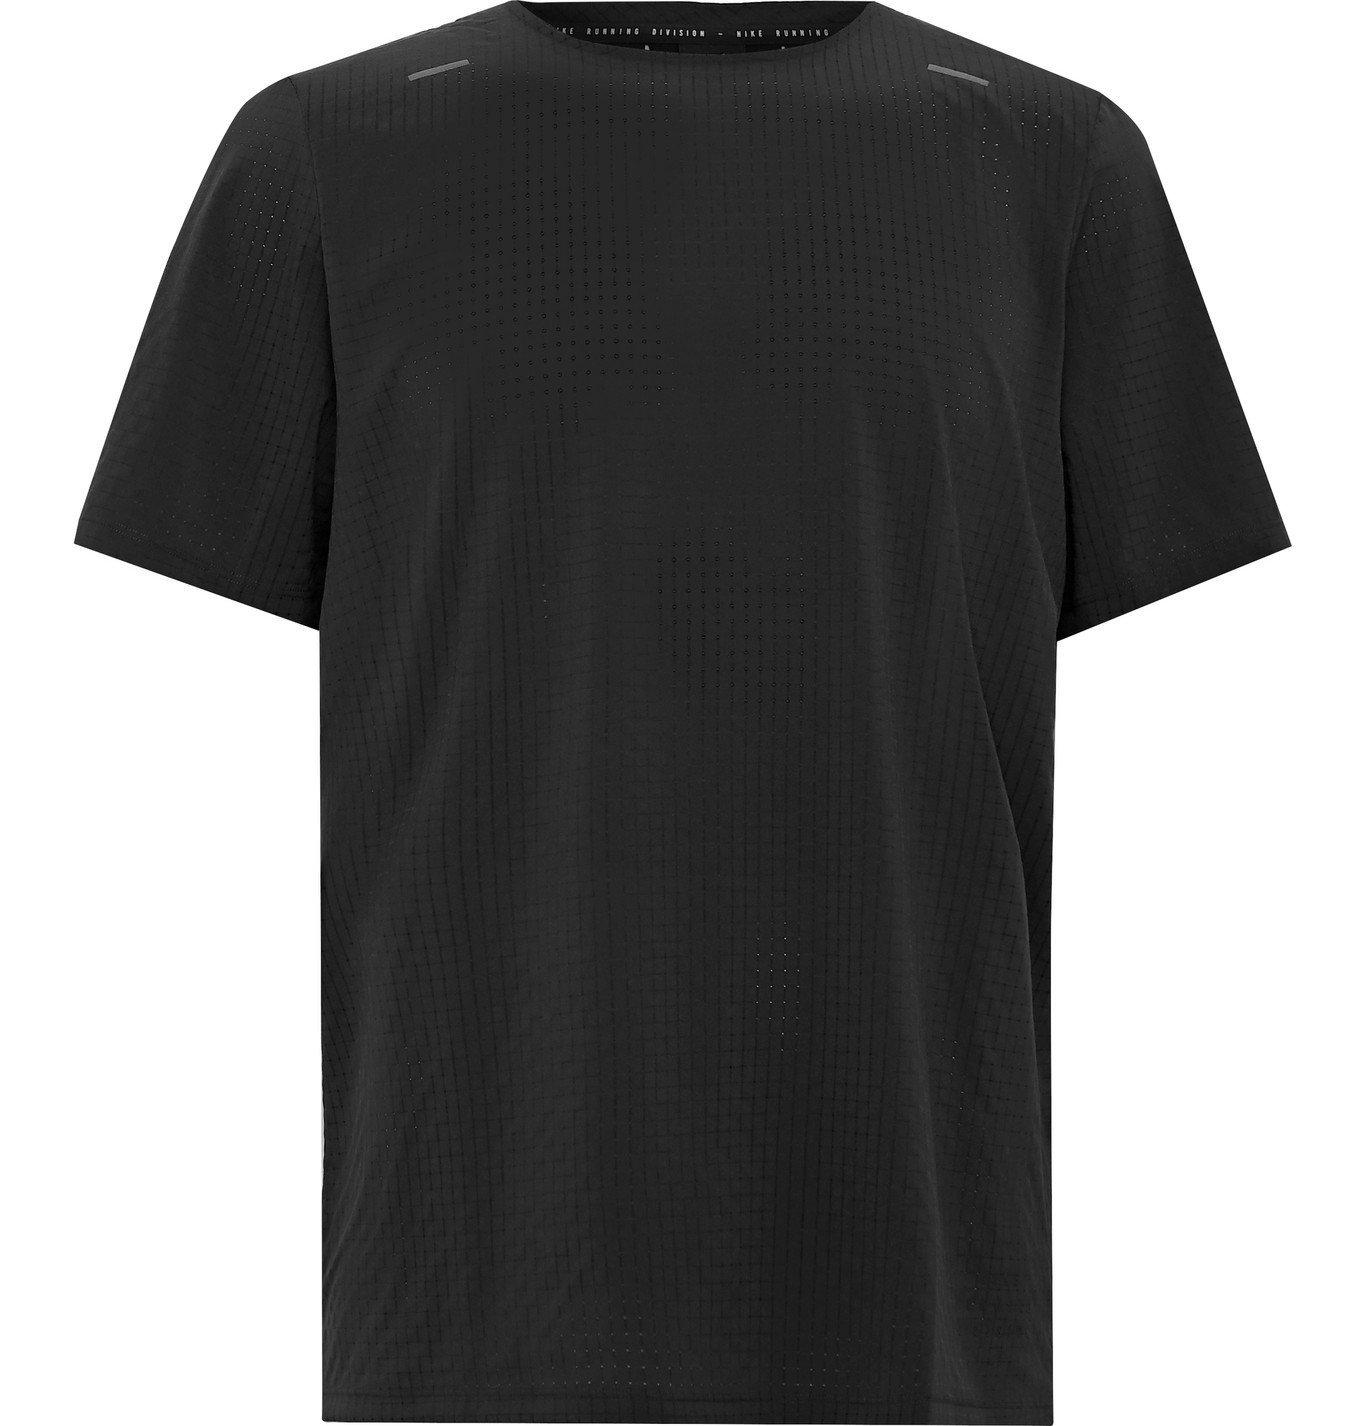 Nike Running - Division Adapt Perforated Dri-FIT T-Shirt - Black